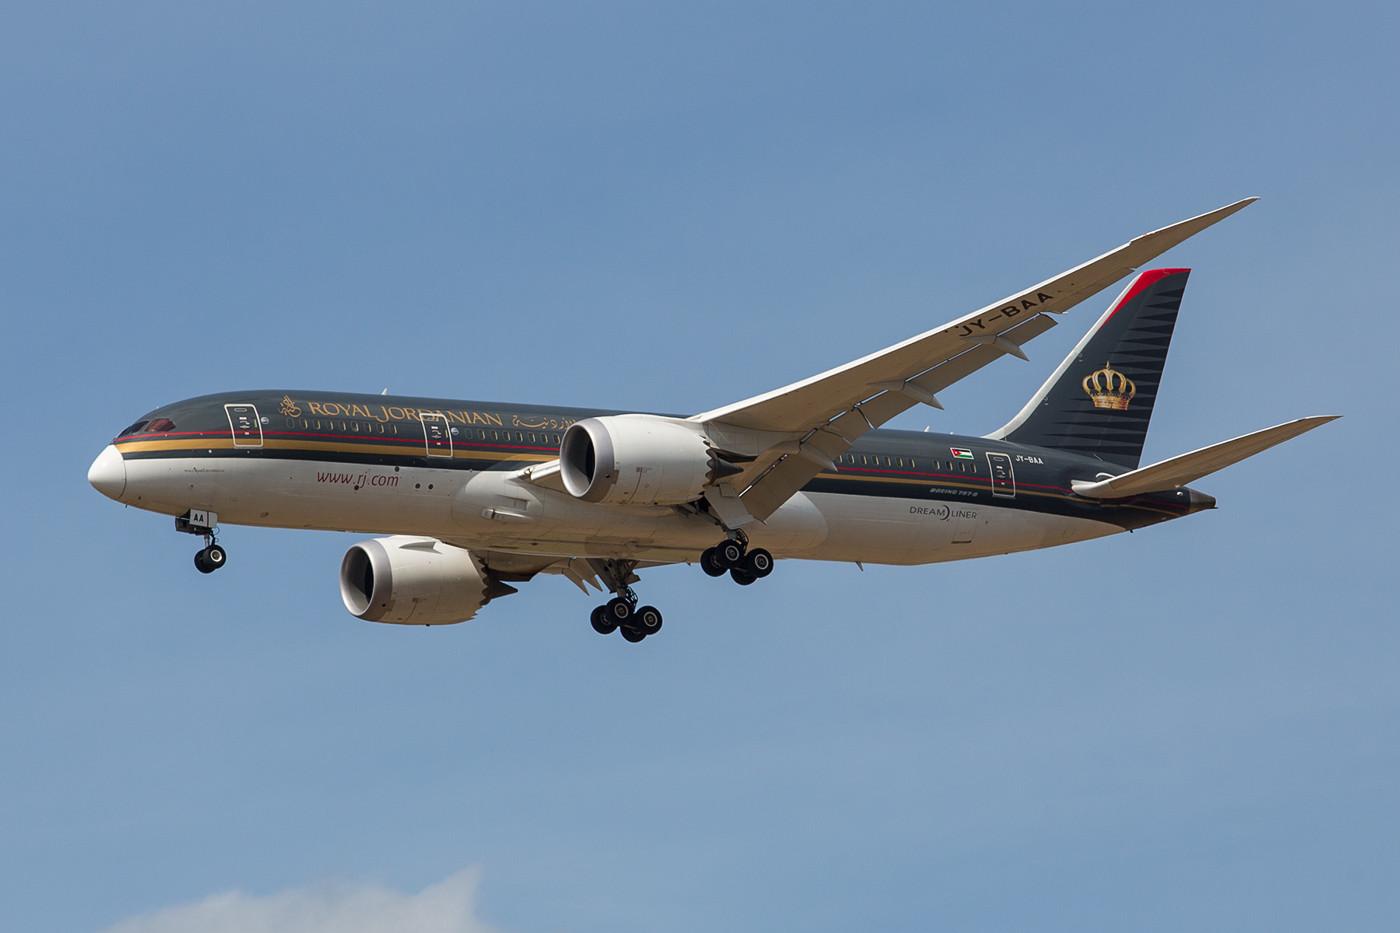 Am Wochenende kommt auch mal Royal Jordanian mit dem Dreamliner aus Amman.